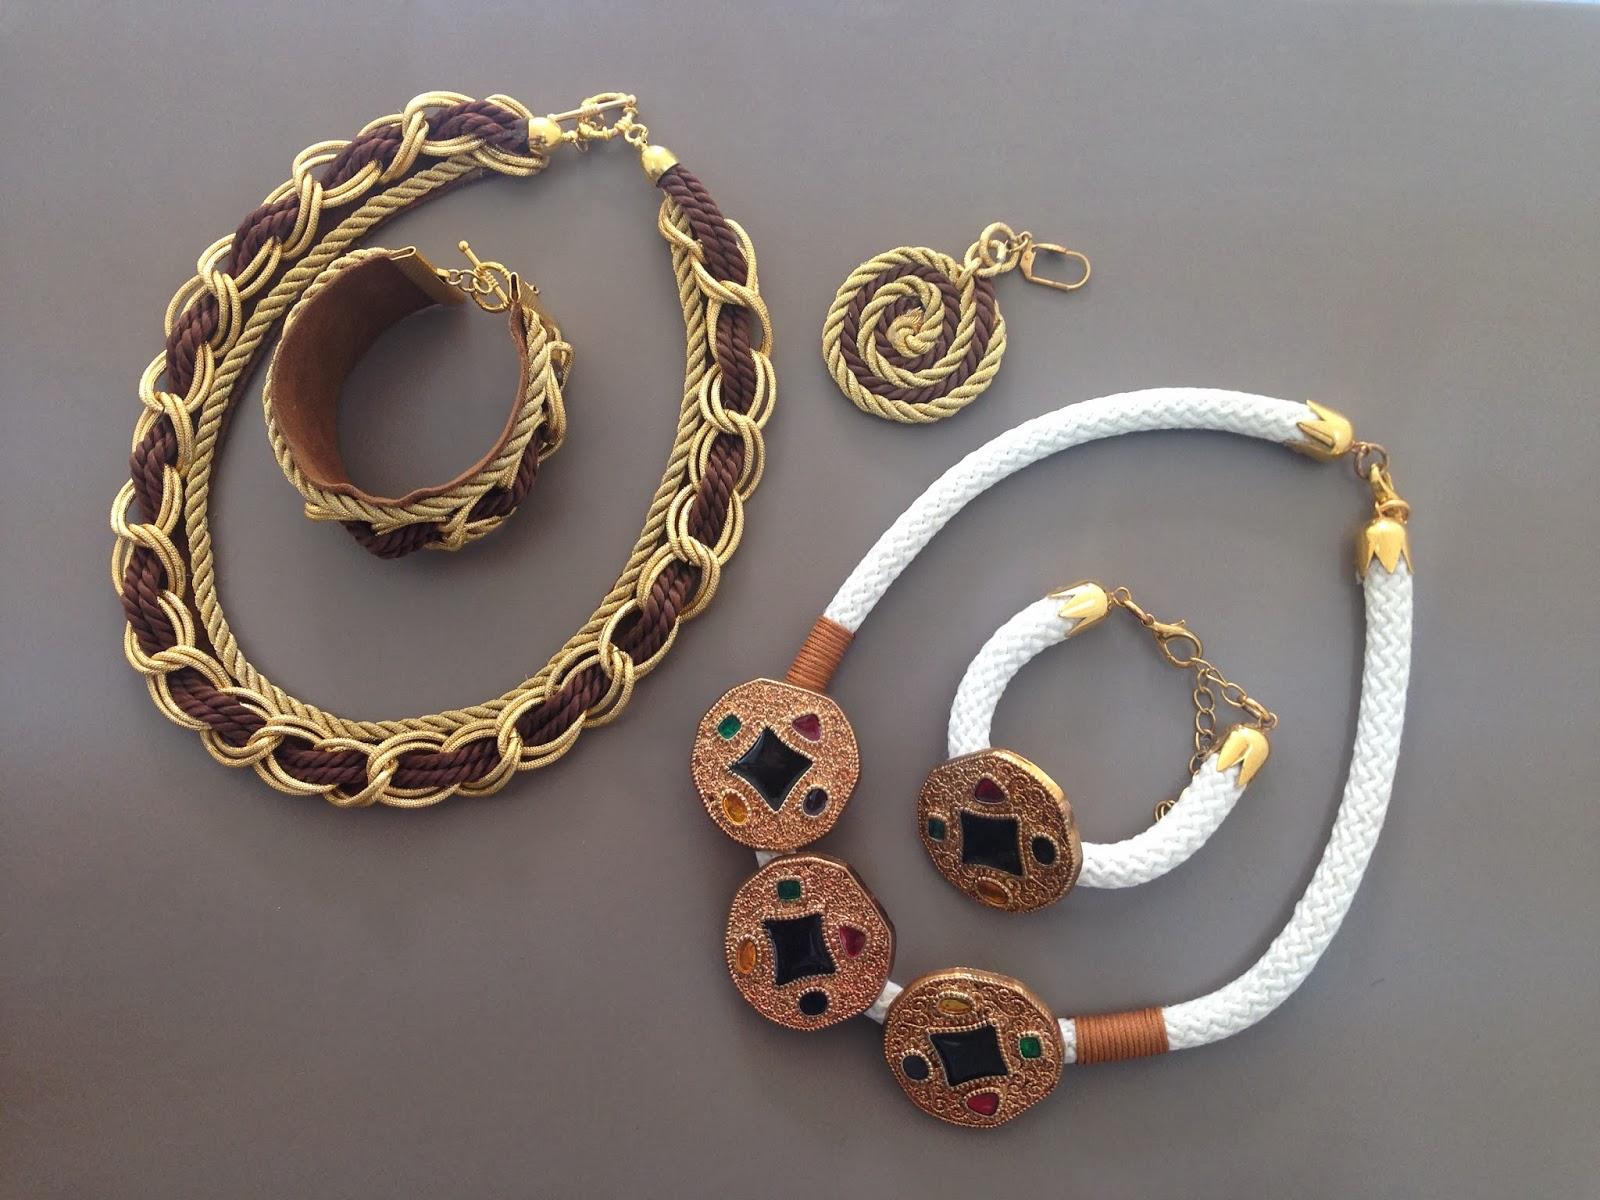 création de bijoux tunisien par Atika handmade